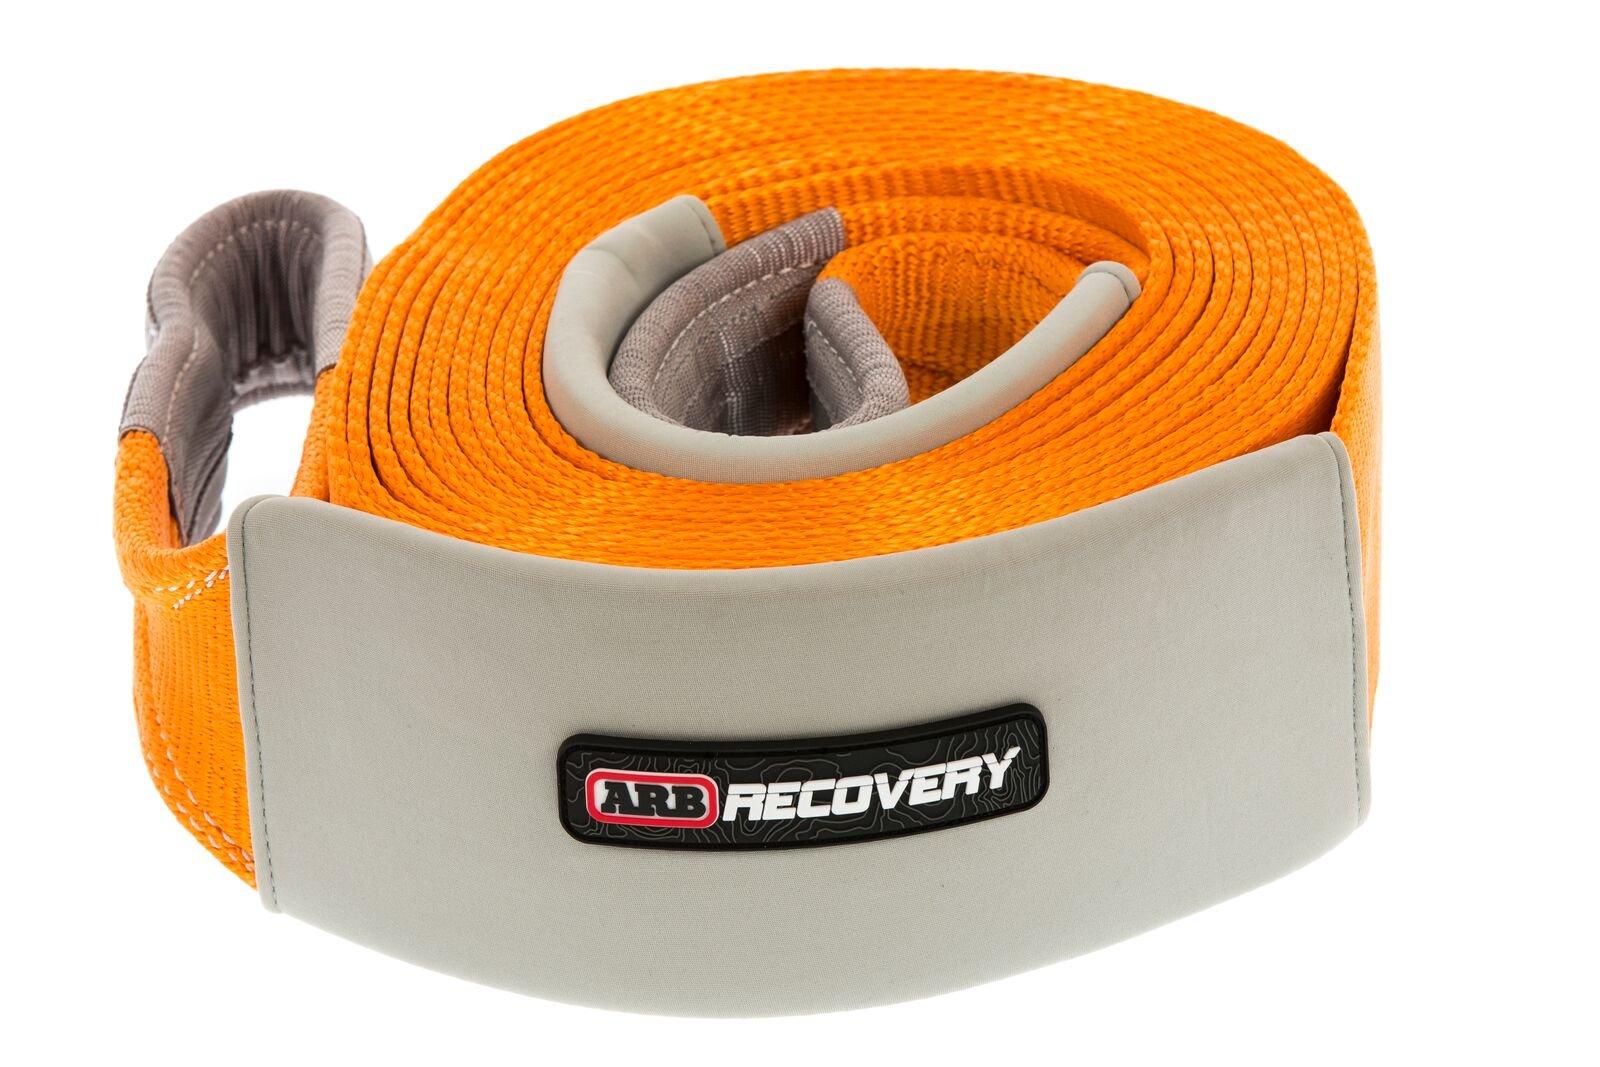 ARB ARB715LB 4-1/3'' x 30' Recovery Strap - 33000 lbs Capacity